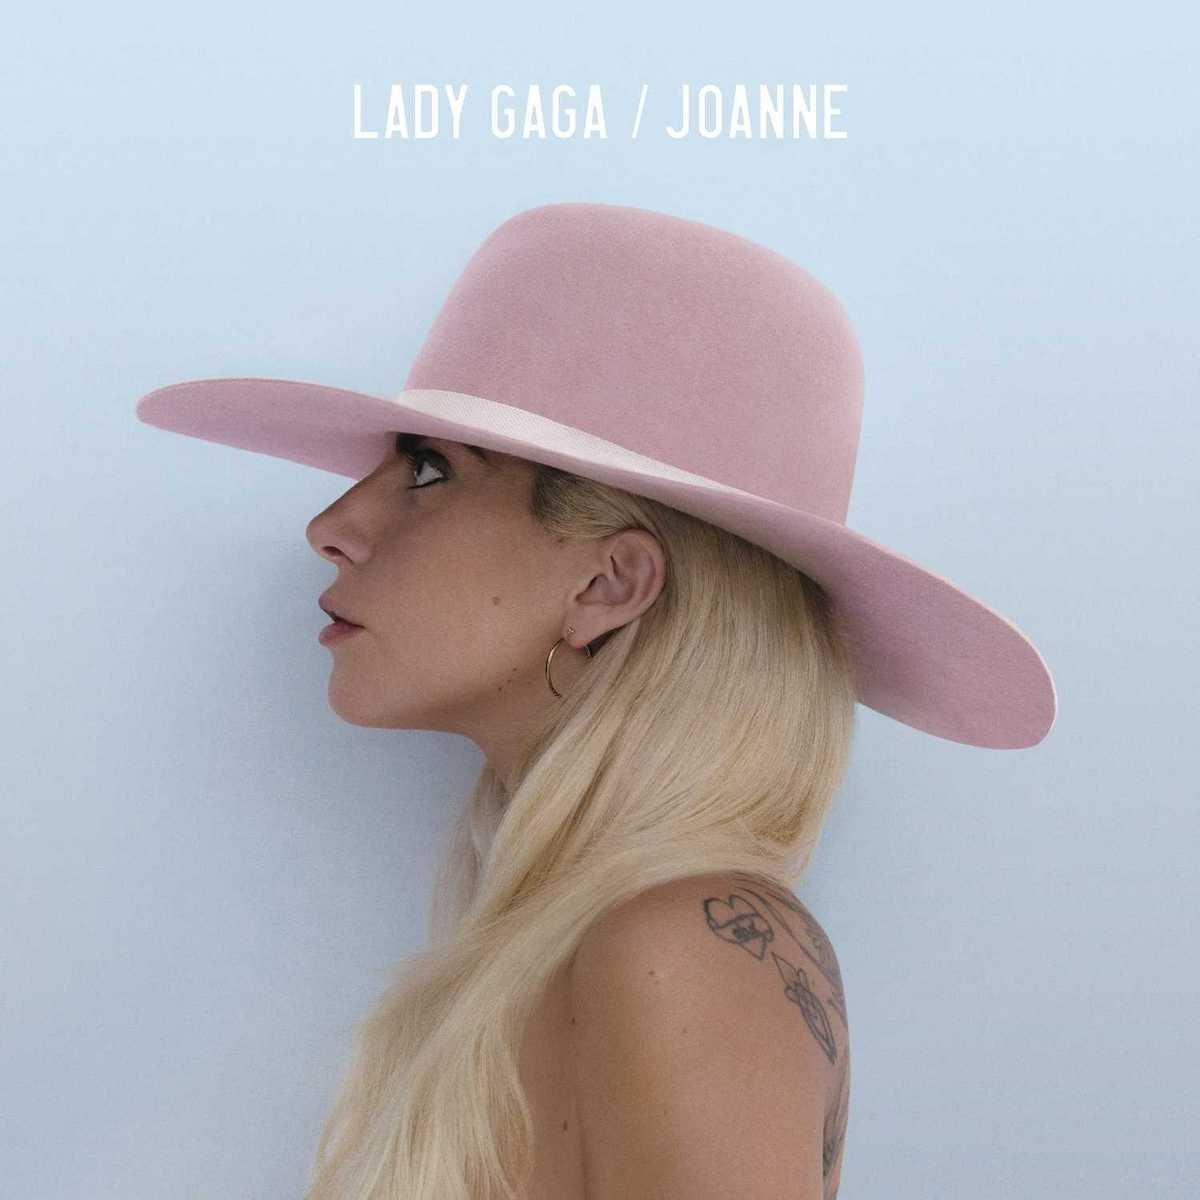 audio review : Joanne ( album ) ... Lady Gaga